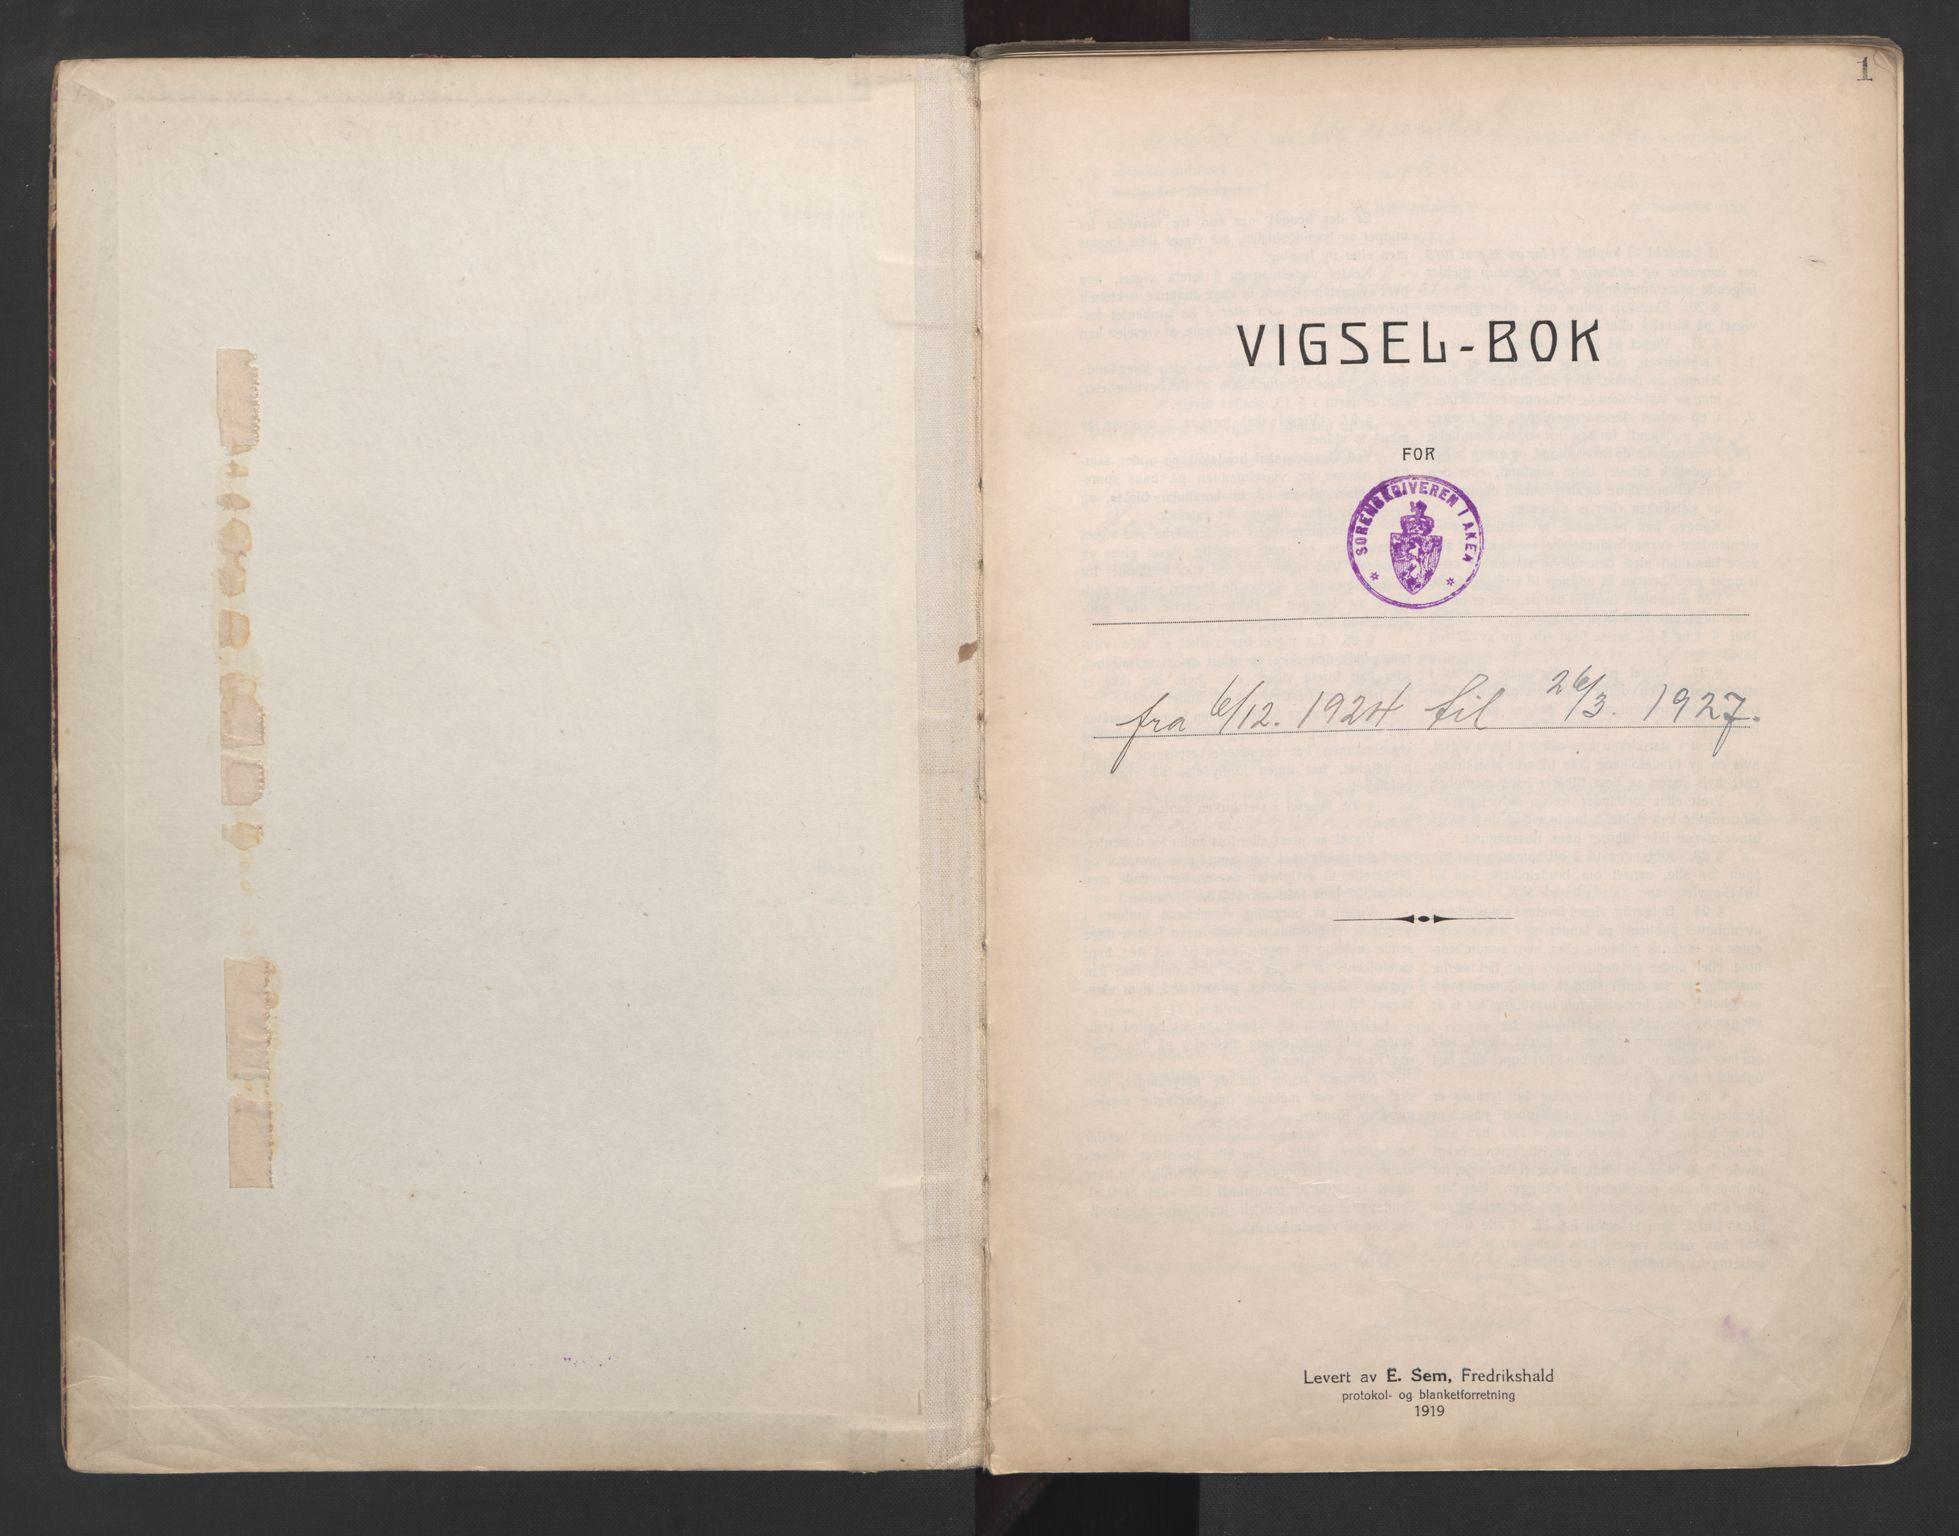 SAO, Aker sorenskriveri, L/Lc/Lcb/L0003: Vigselprotokoll, 1924-1927, s. 1